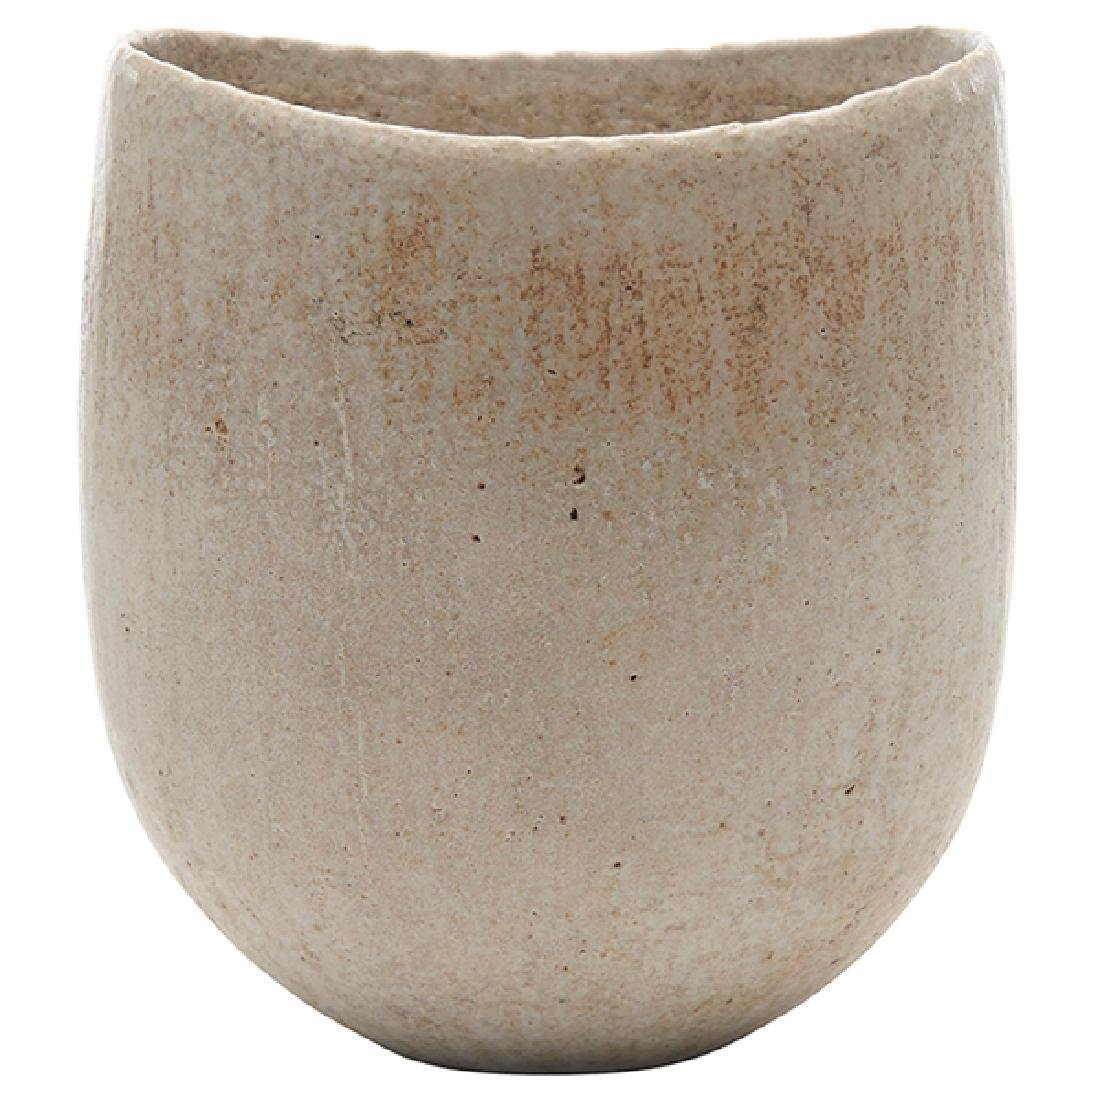 John Ward (b. 1938), vase, Wales, UK, matte glazed